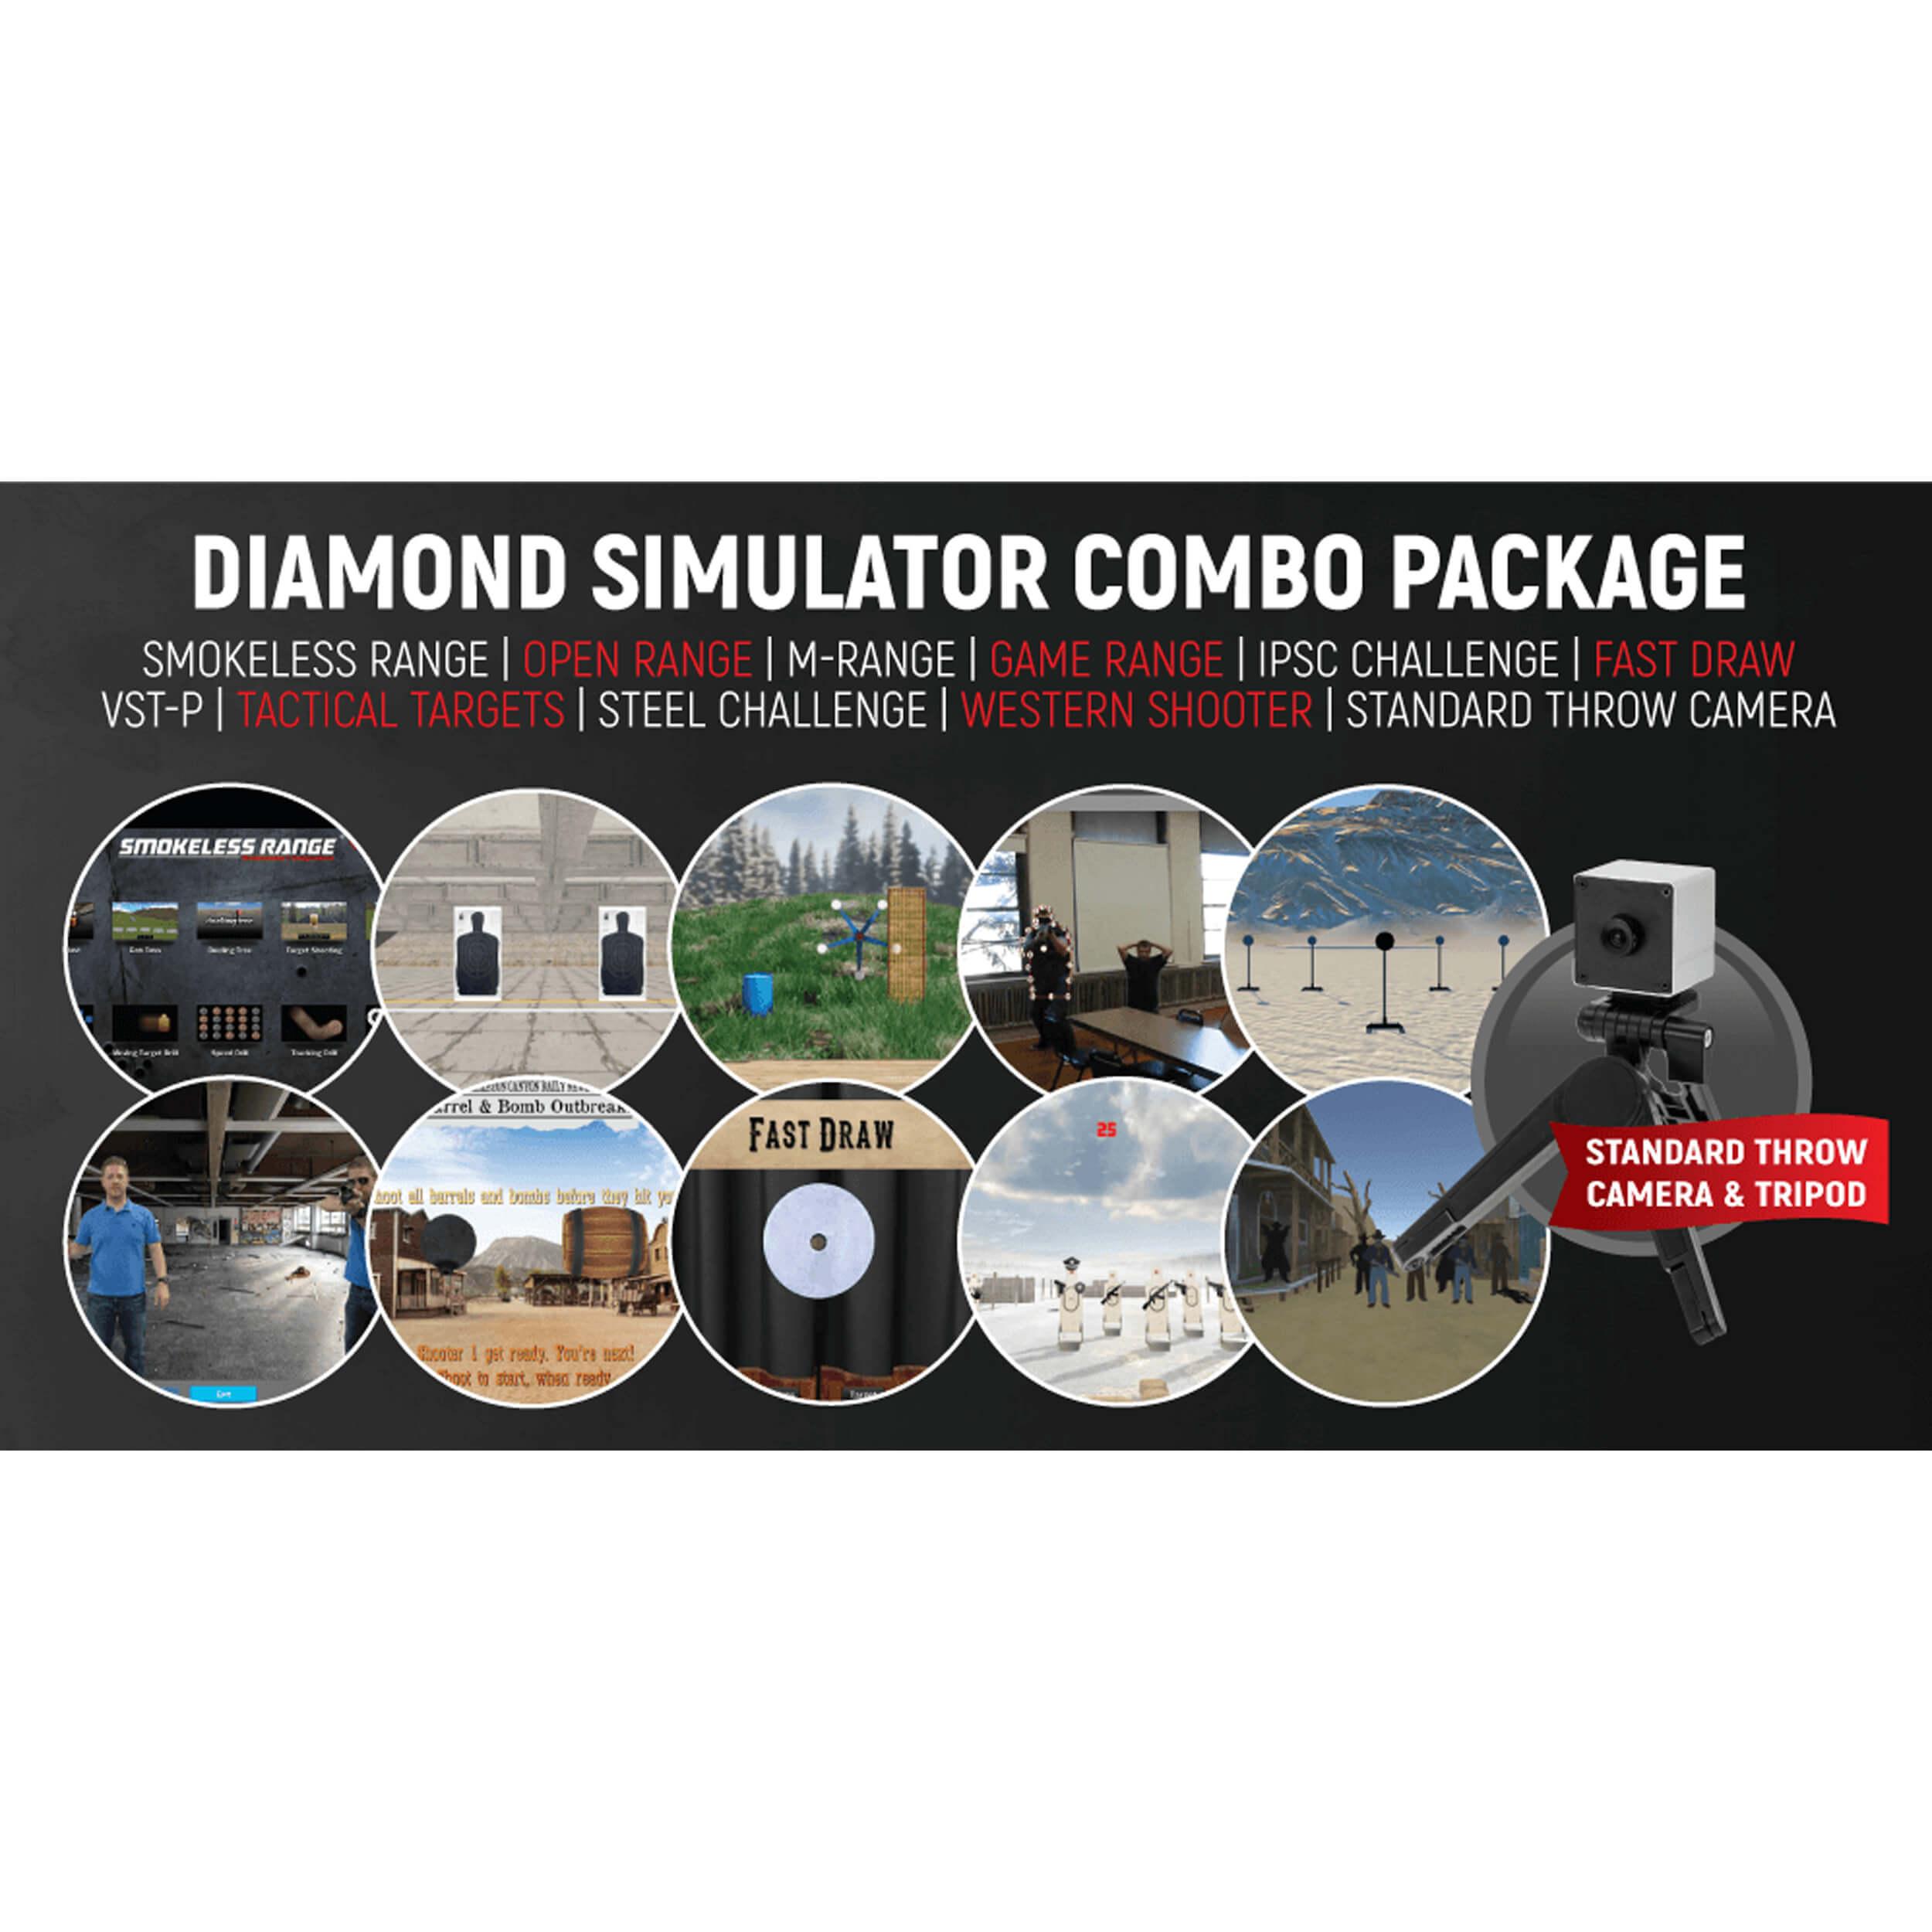 Diamond Smokeless Range ® Simulator Combo Package - DSCP002